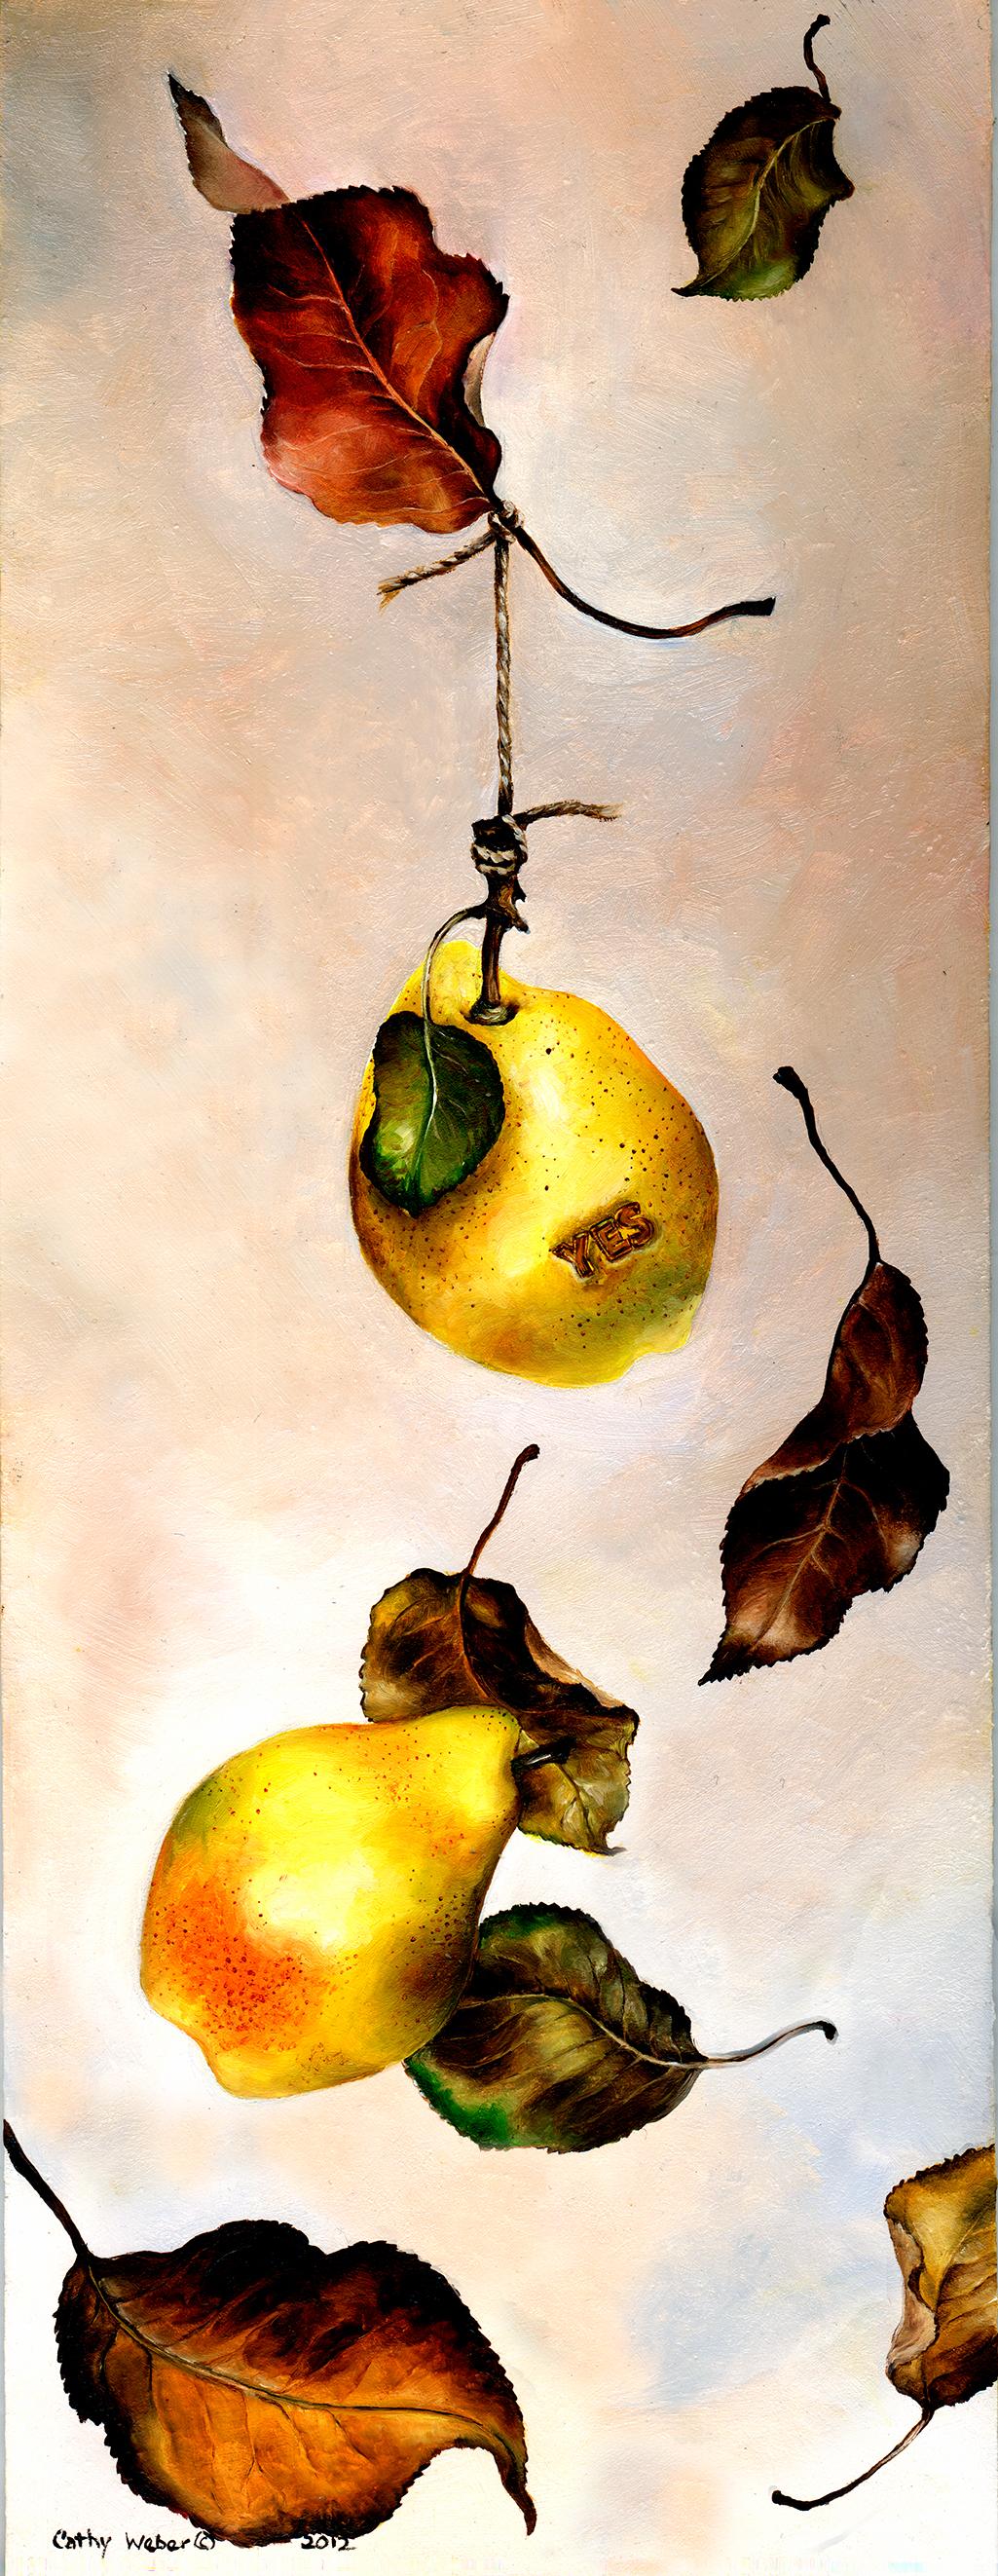 cathy weber - art - painting - woman - oil - montana - oil - object - pear